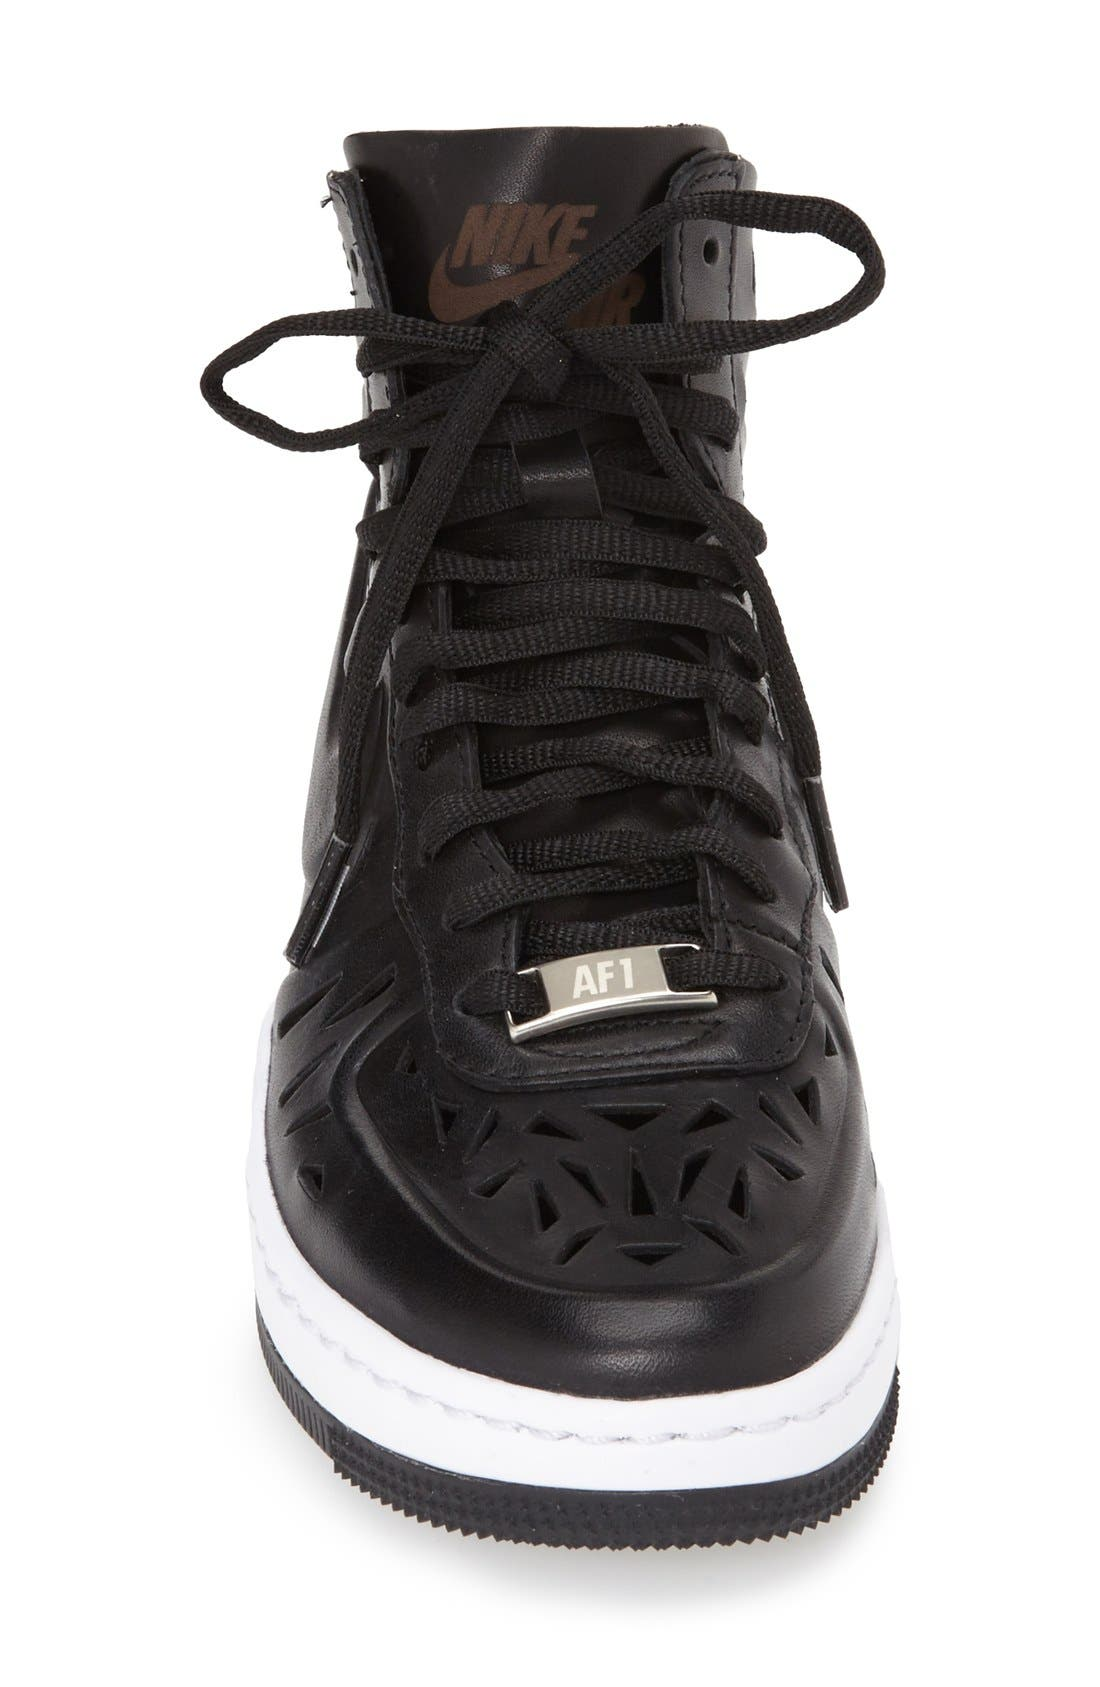 Alternate Image 2  - Nike 'AF1 Ultra Force Mid Joli' High Top Sneaker (Women)